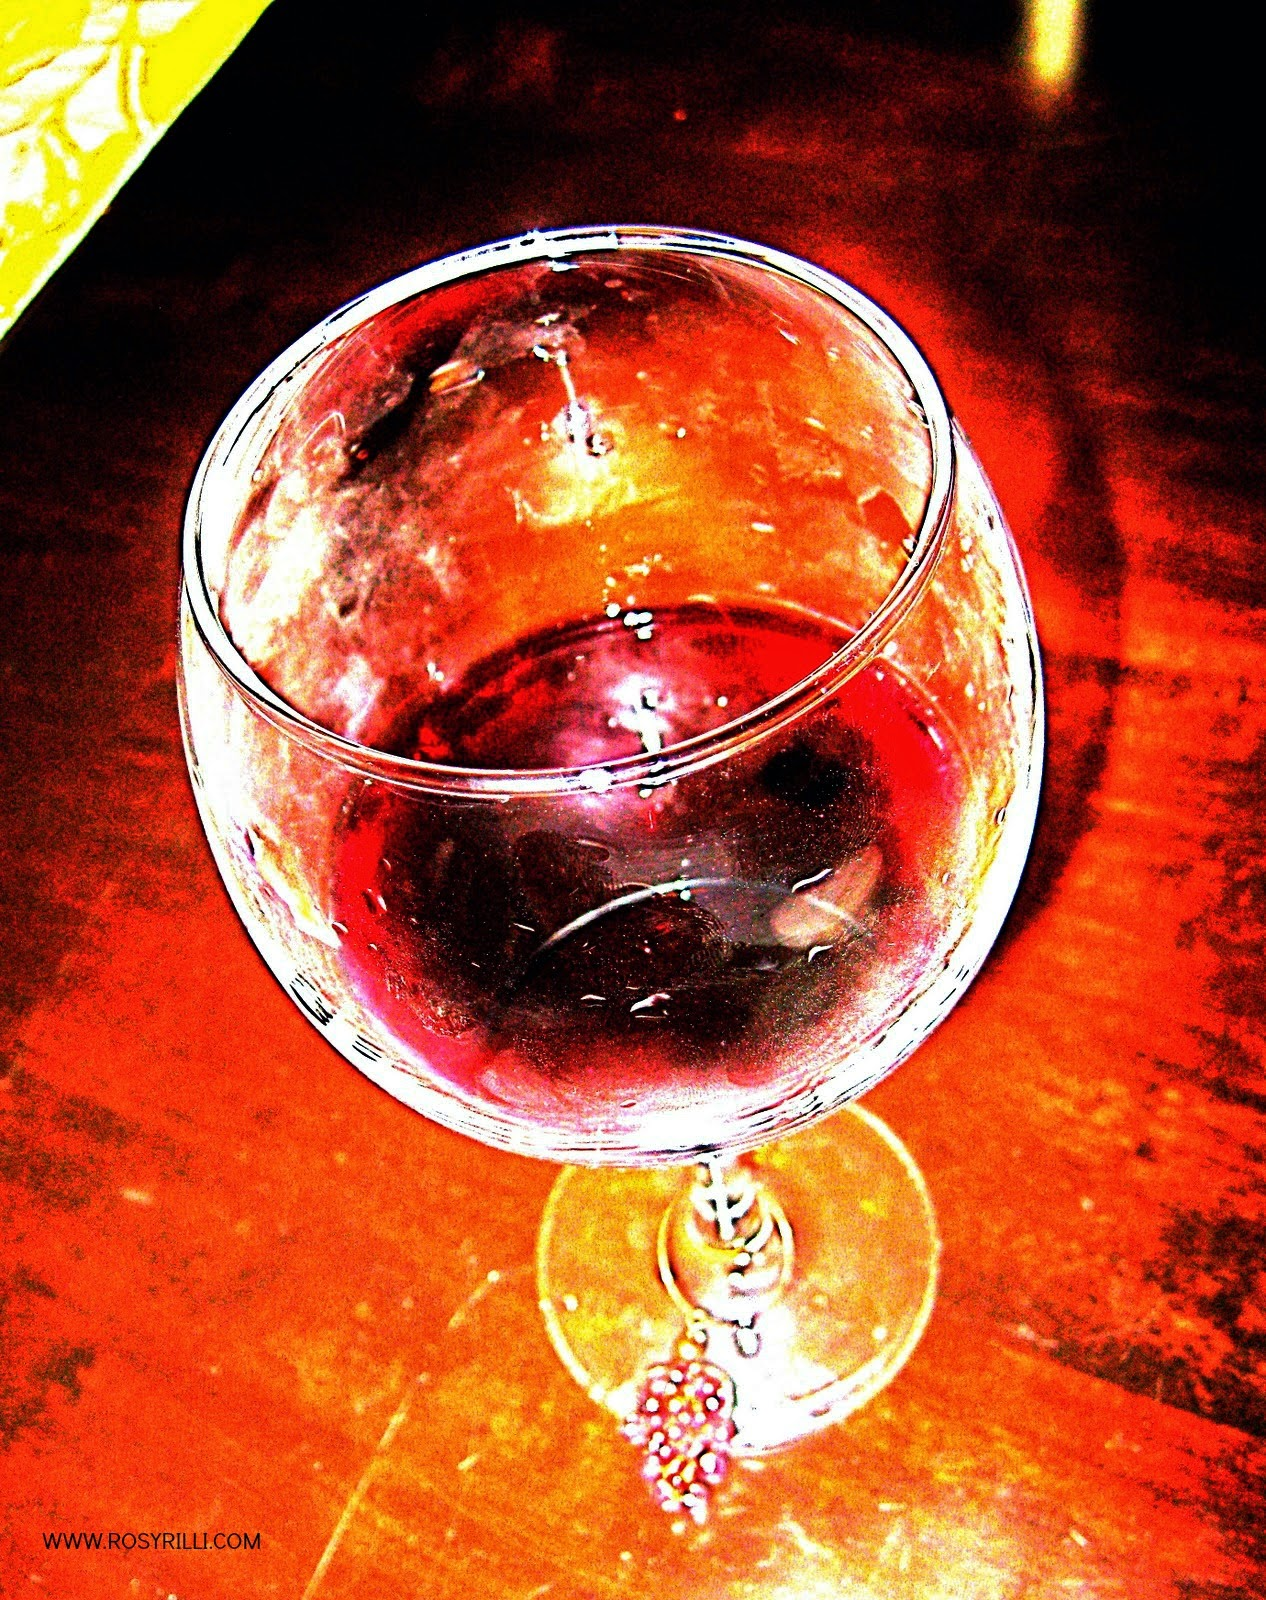 ROSYRILLI.COM Red wine to unwind